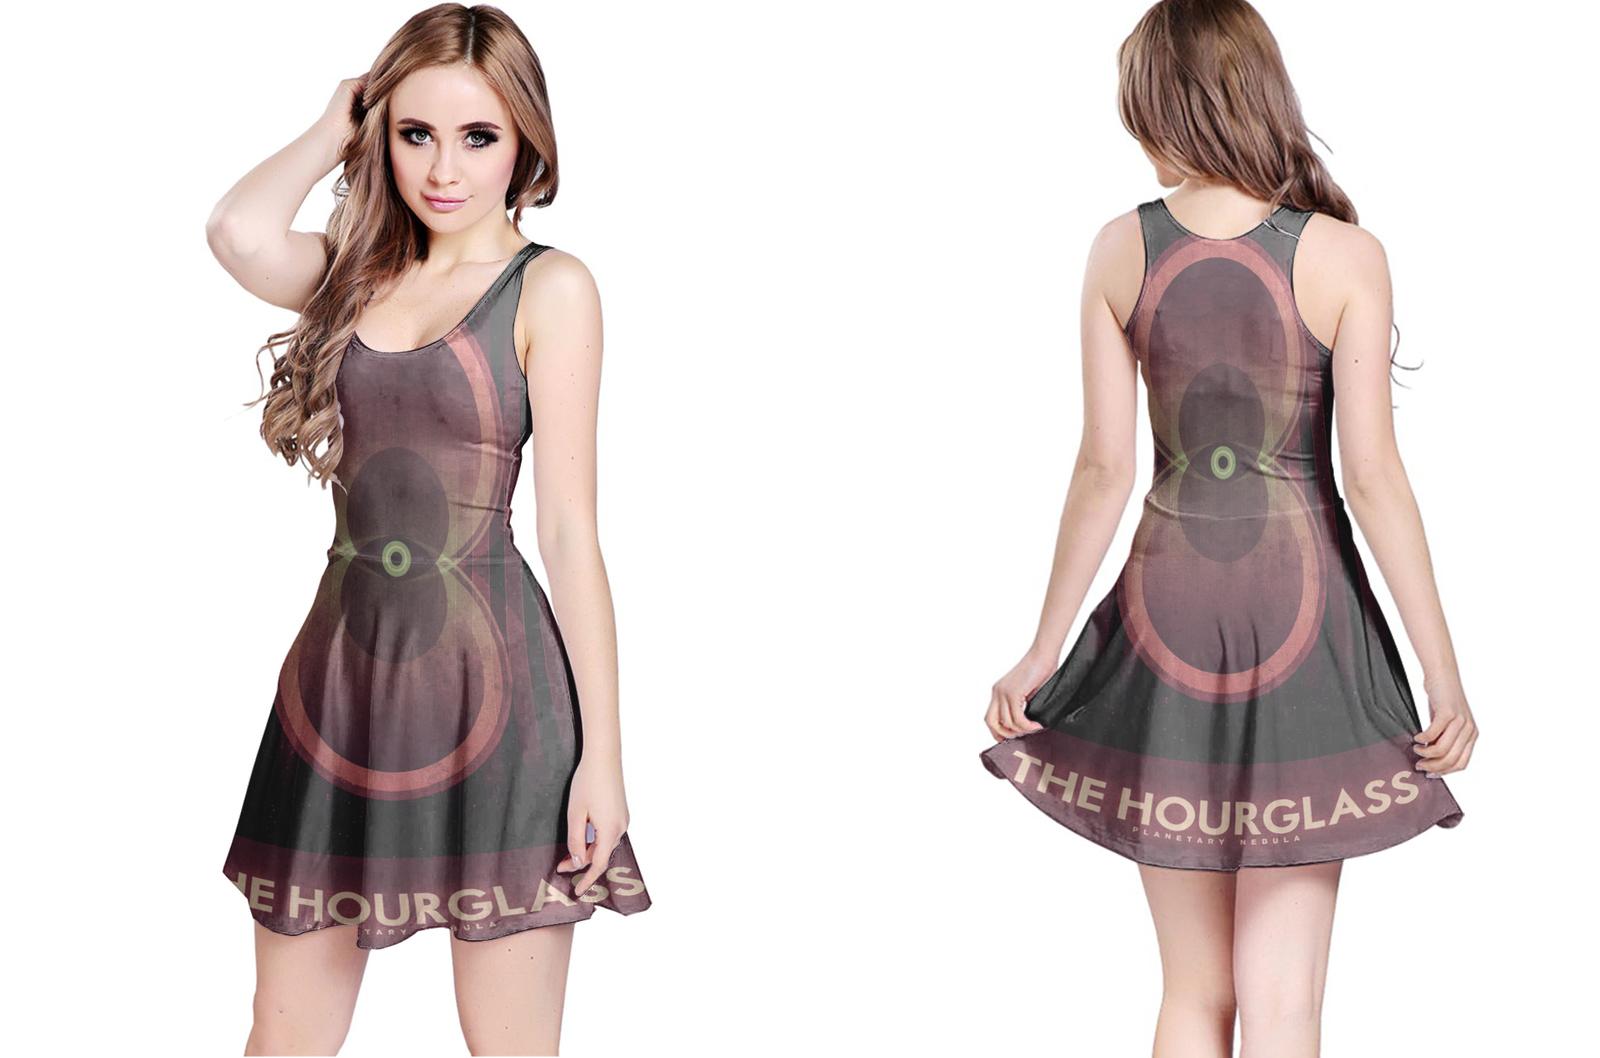 Planetary nebula the hourglass reversible dress